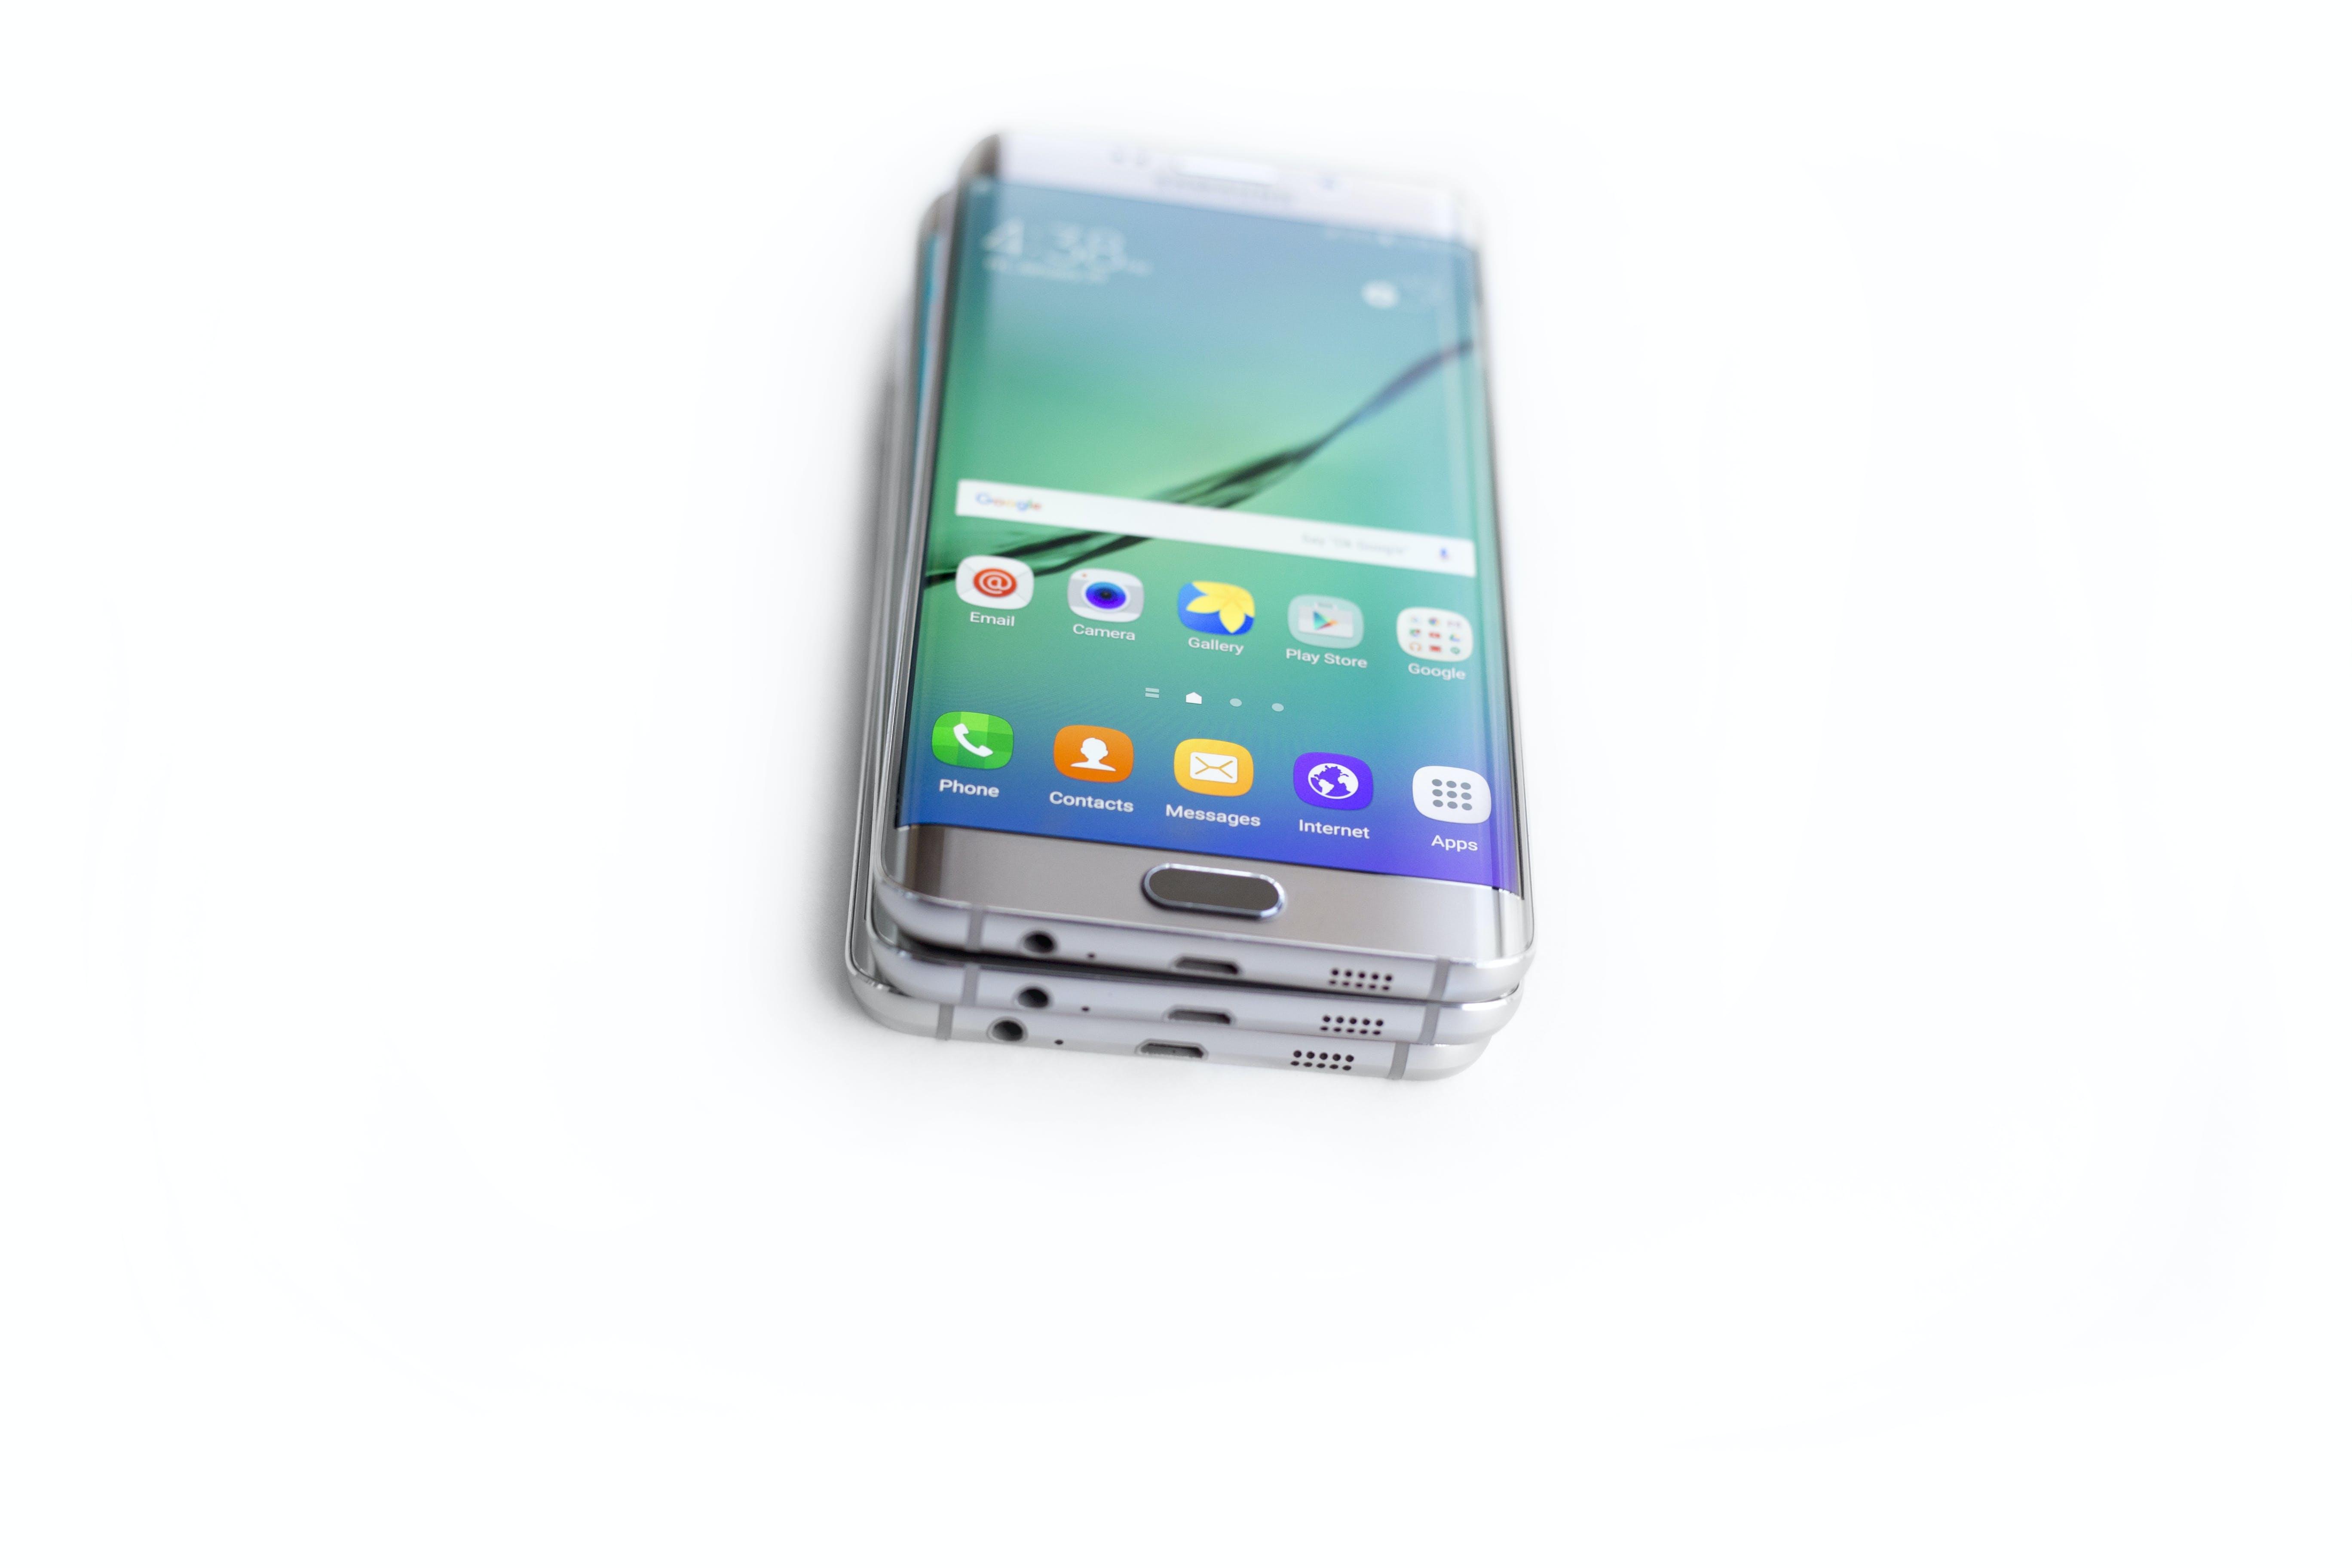 Kostenloses Stock Foto zu andriod telefon, edge-plus, gestapelte phones, samsung galaxy s6 edge-plus